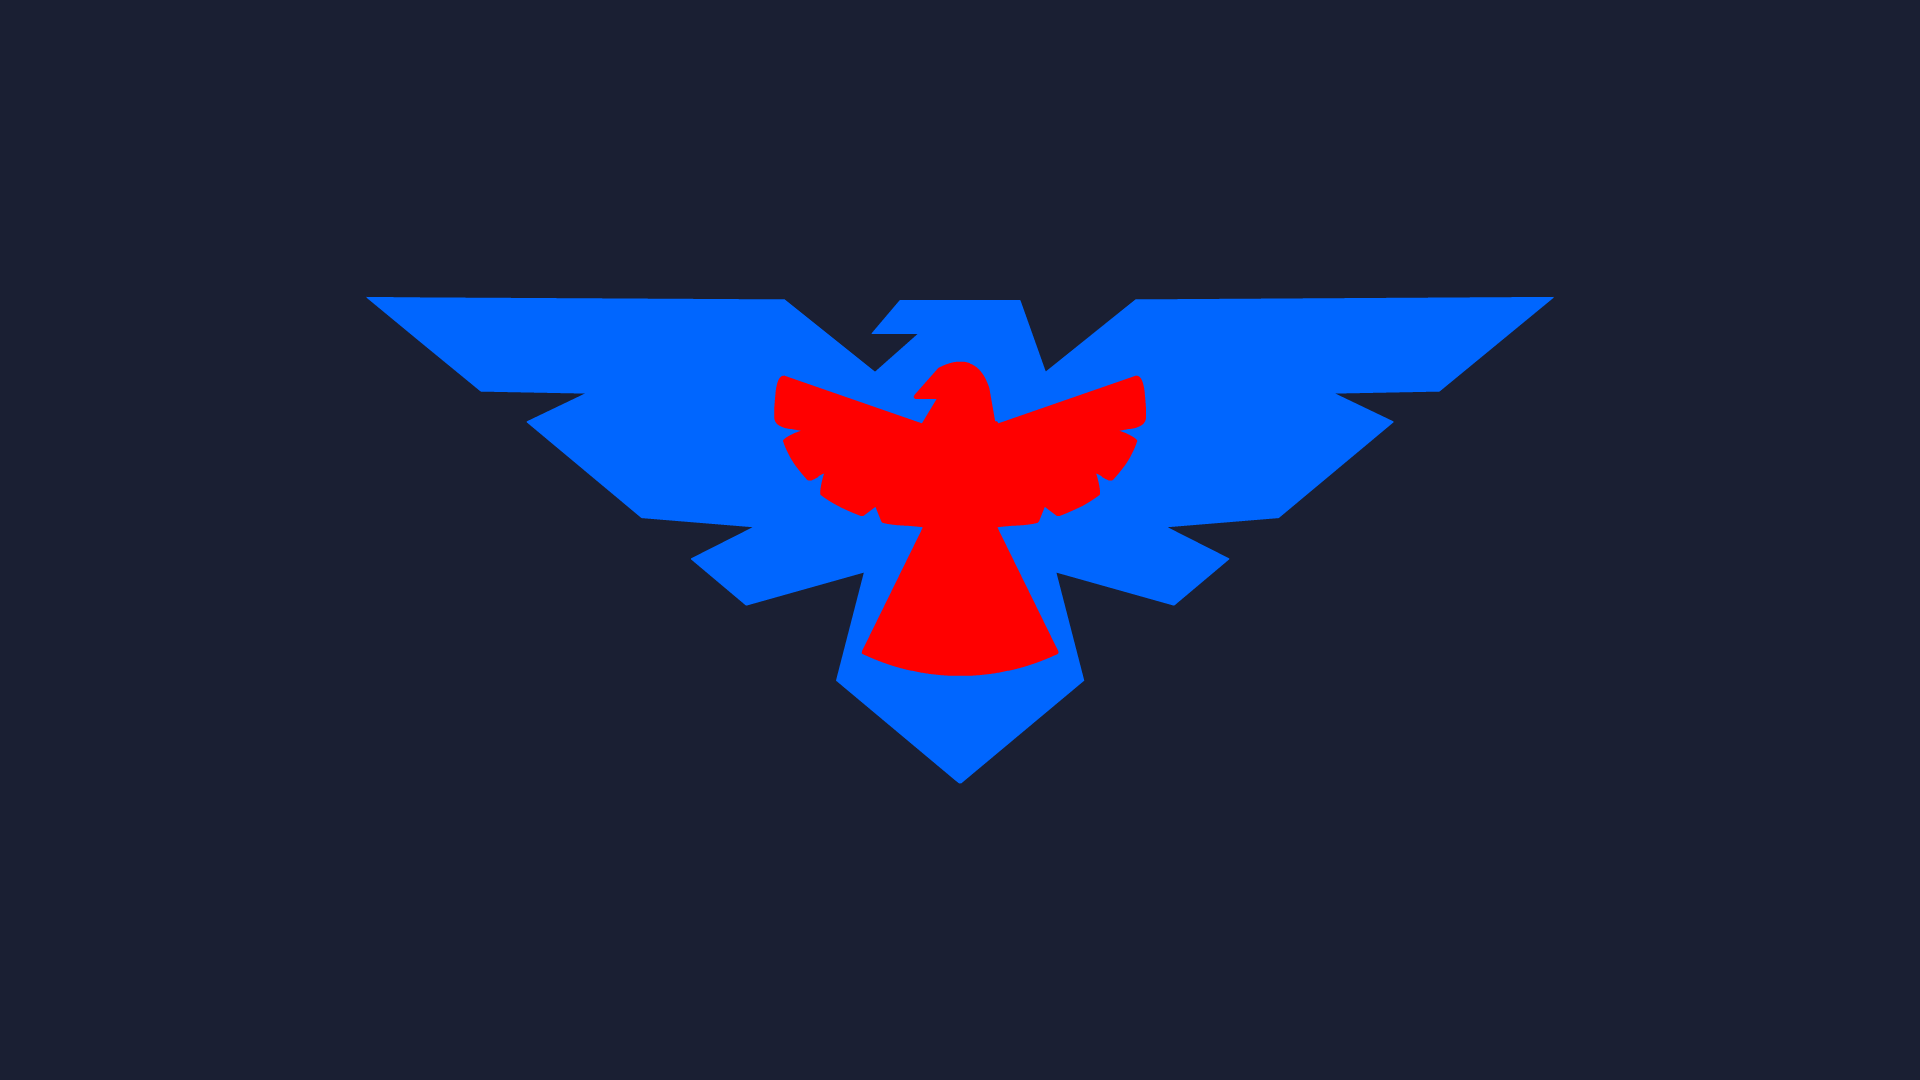 Nightwing Symbol Wallpaper 1920 x 1080nightwing symbol 1920x1080